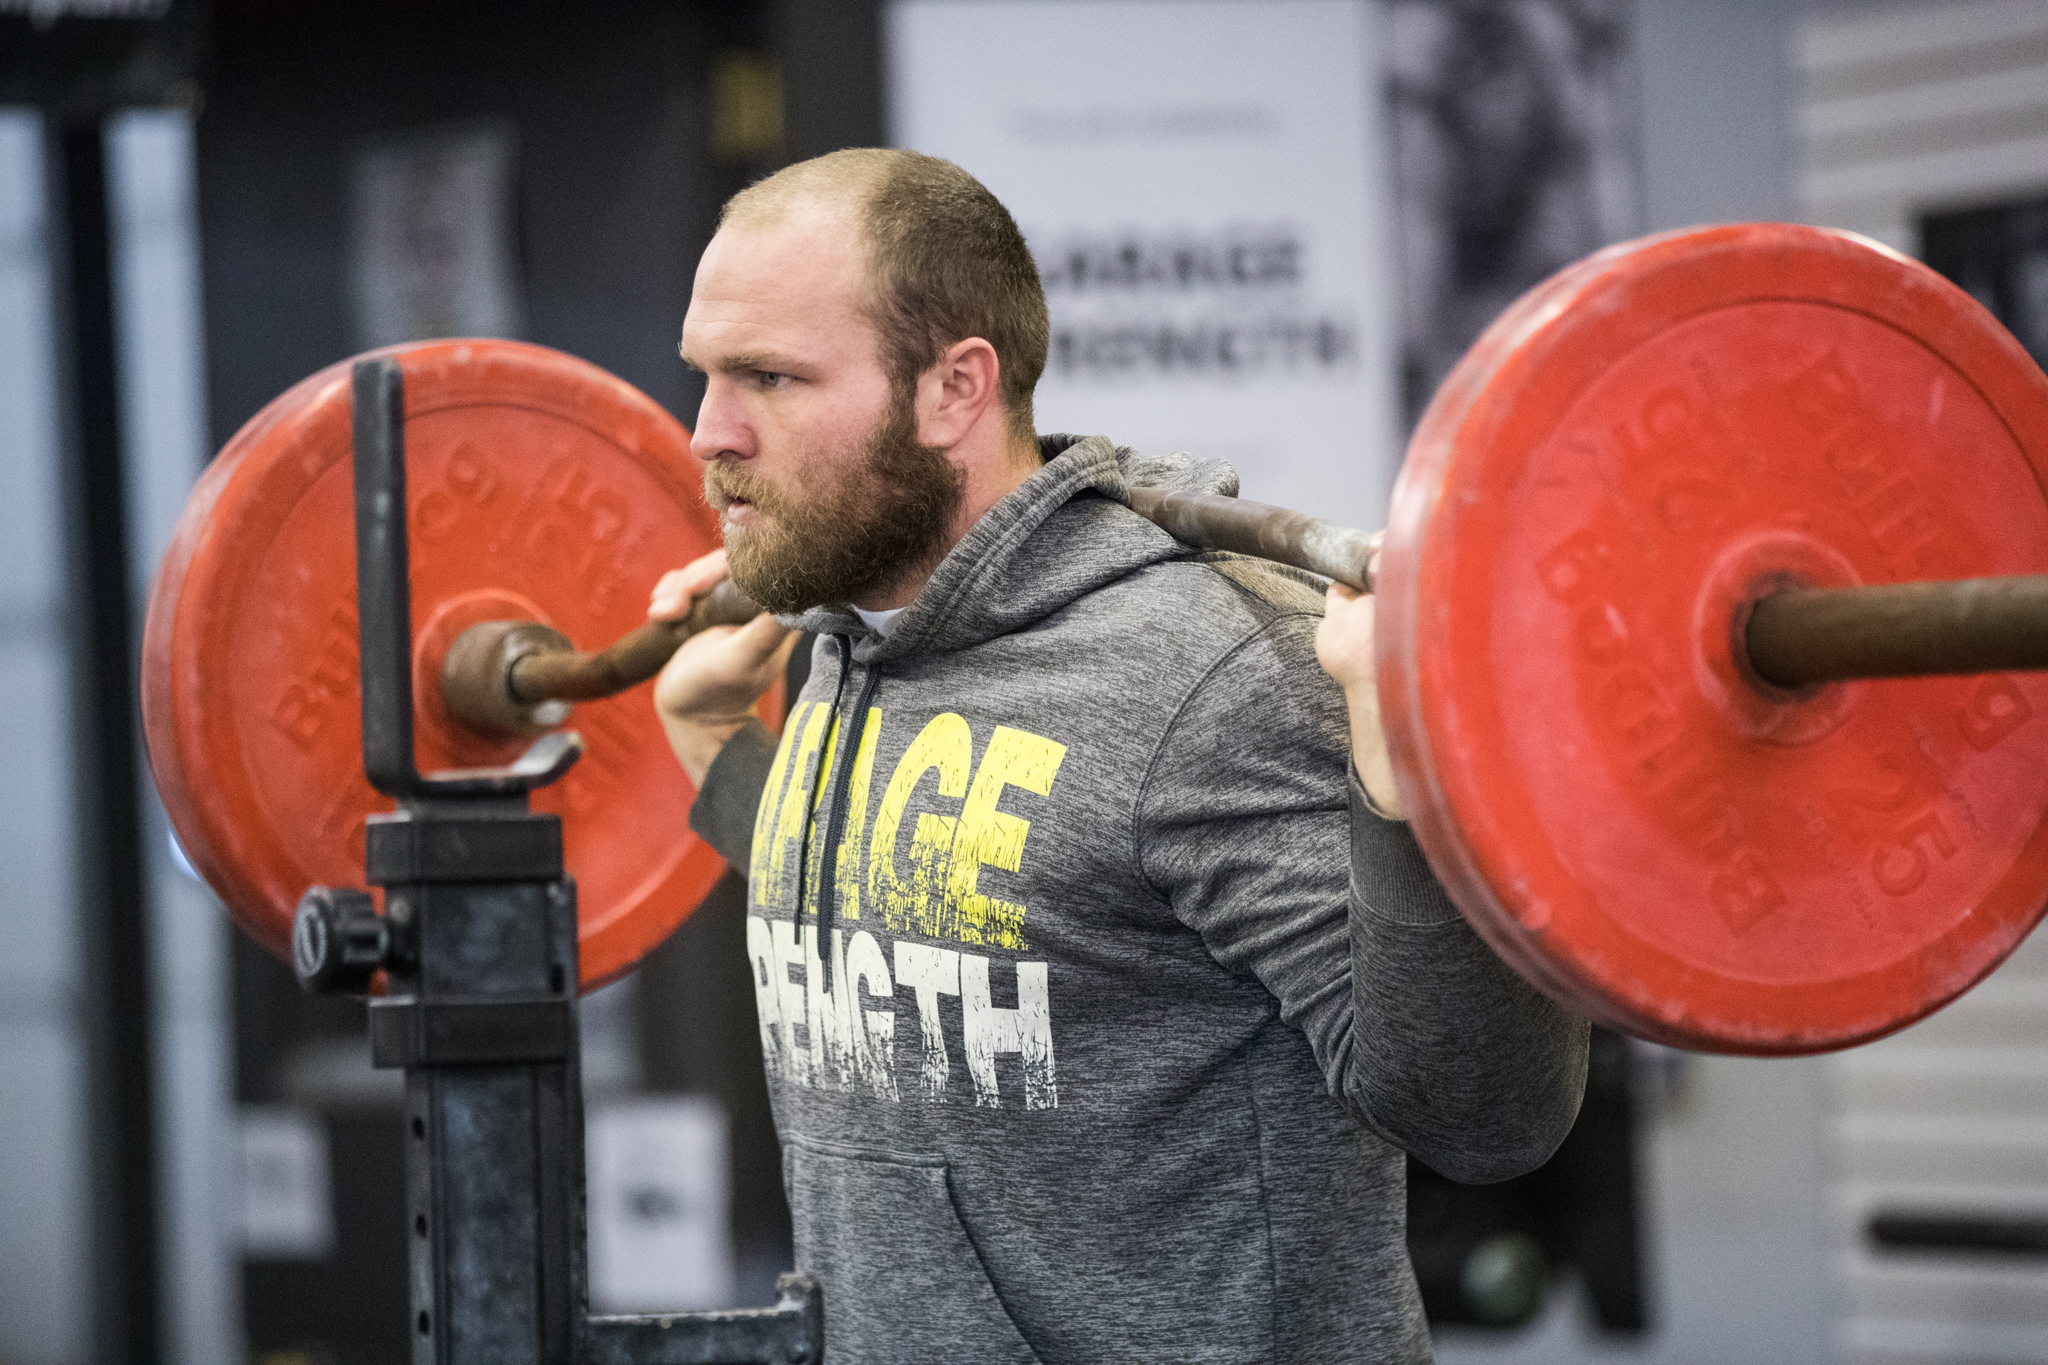 dane-miller-weightlifting-photography-garage-strength_1.JPG